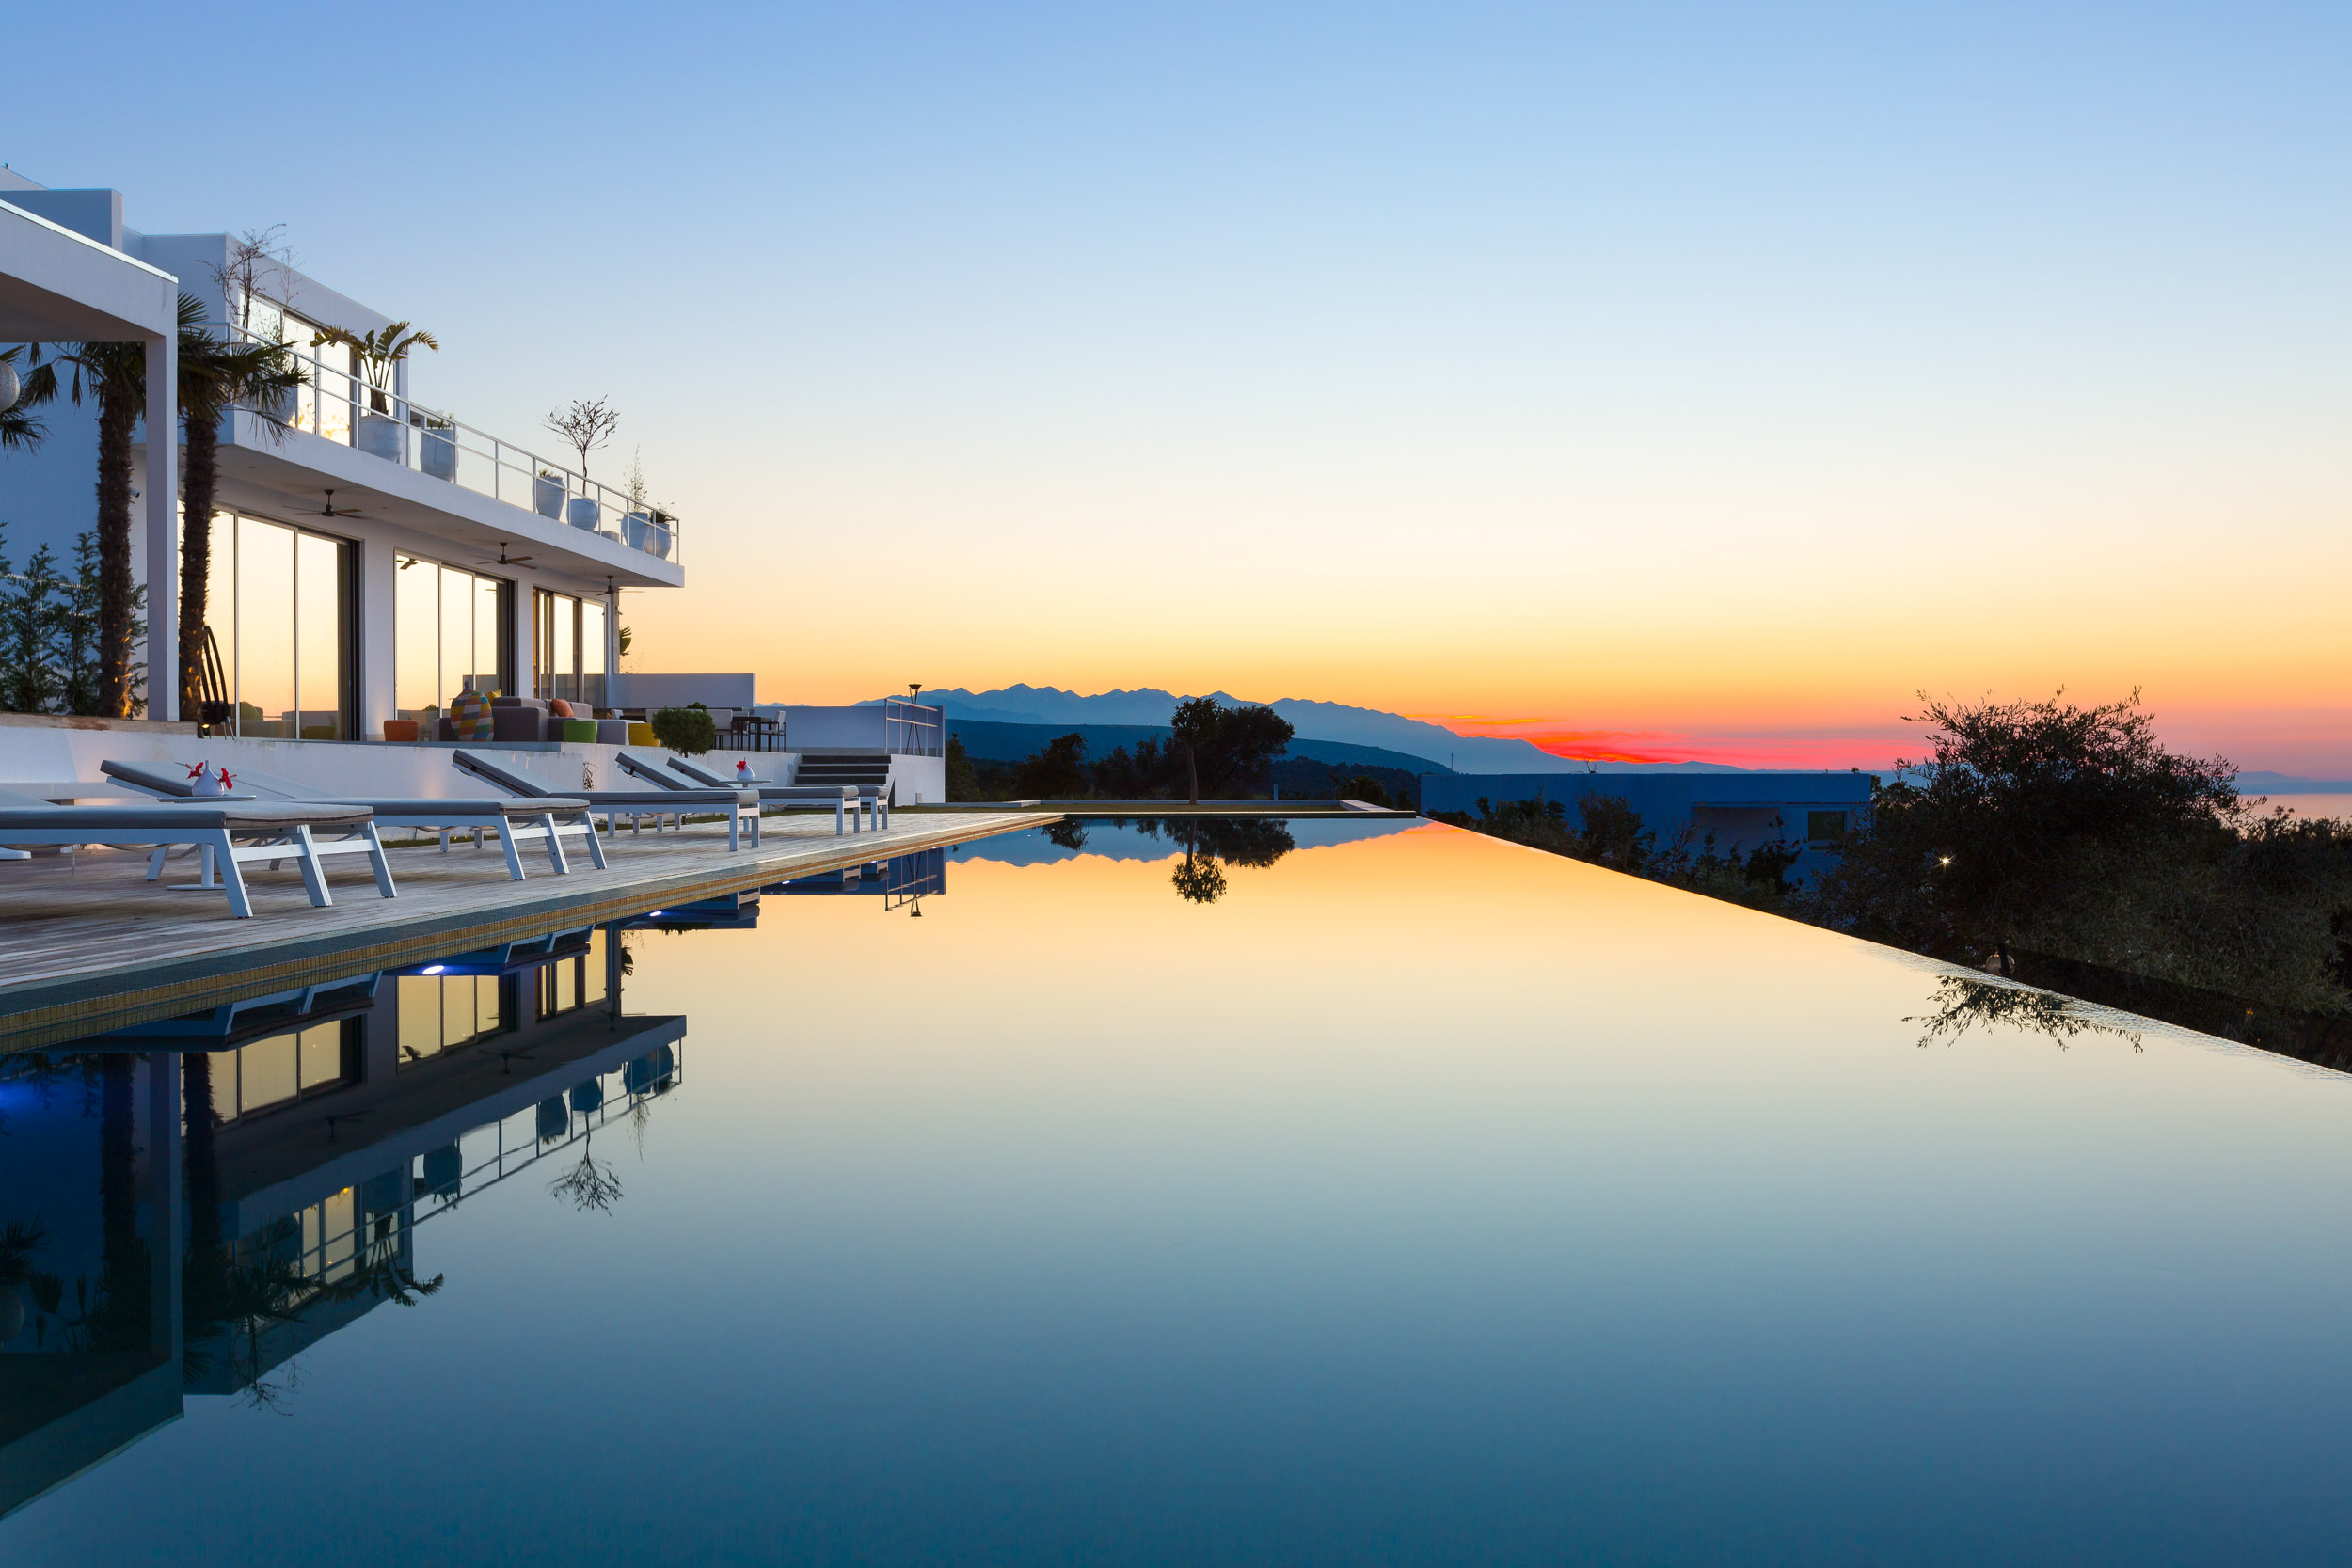 Photo Prortfolio - Estate & Hotel